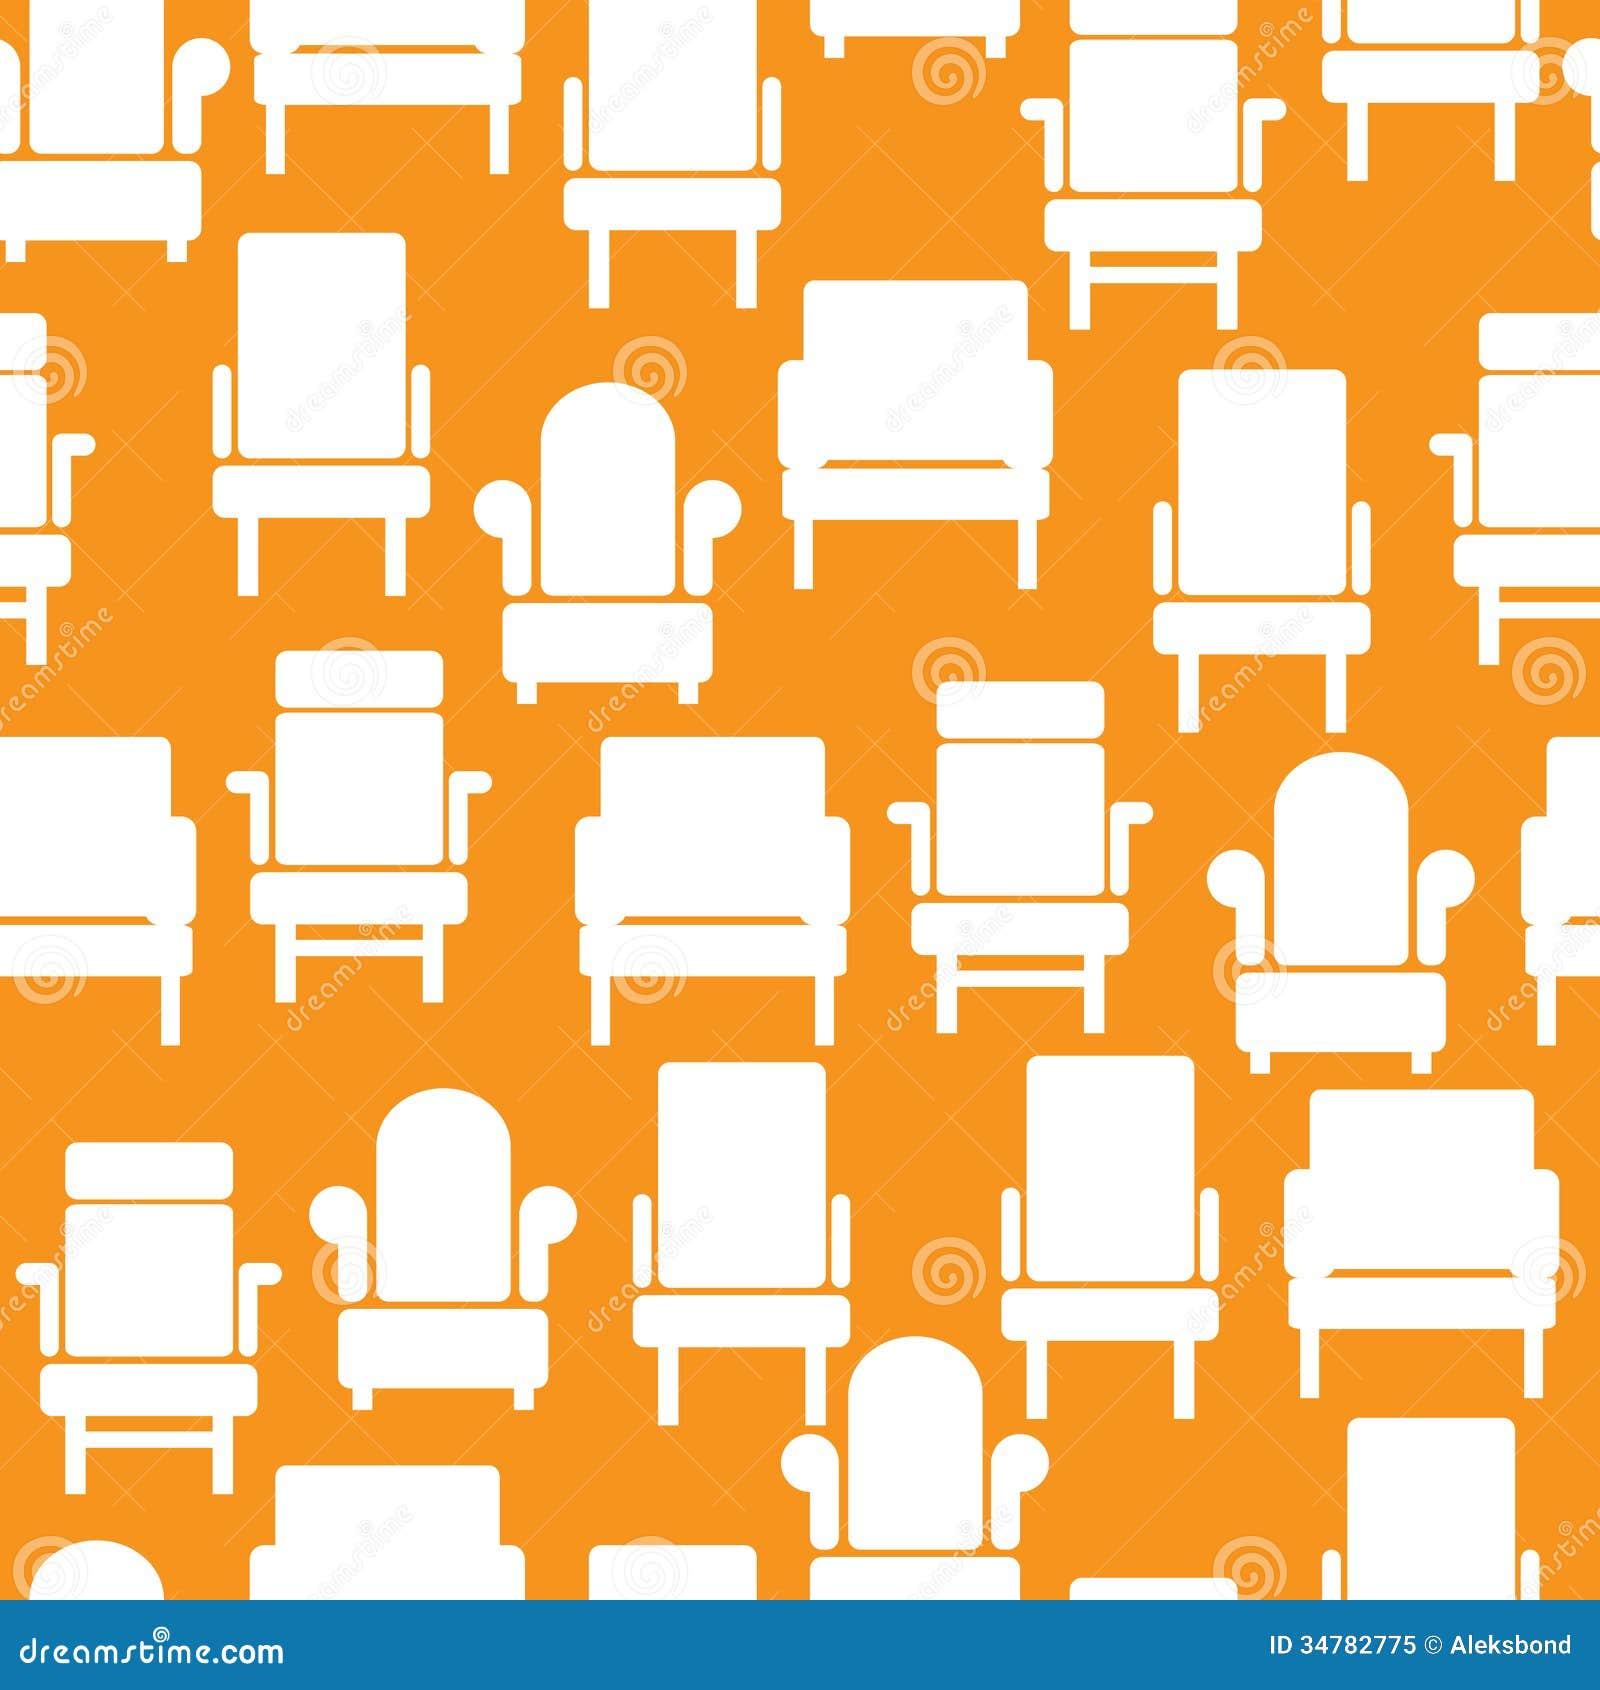 pattern furniture. Icons Of Furniture On Seamless Pattern I